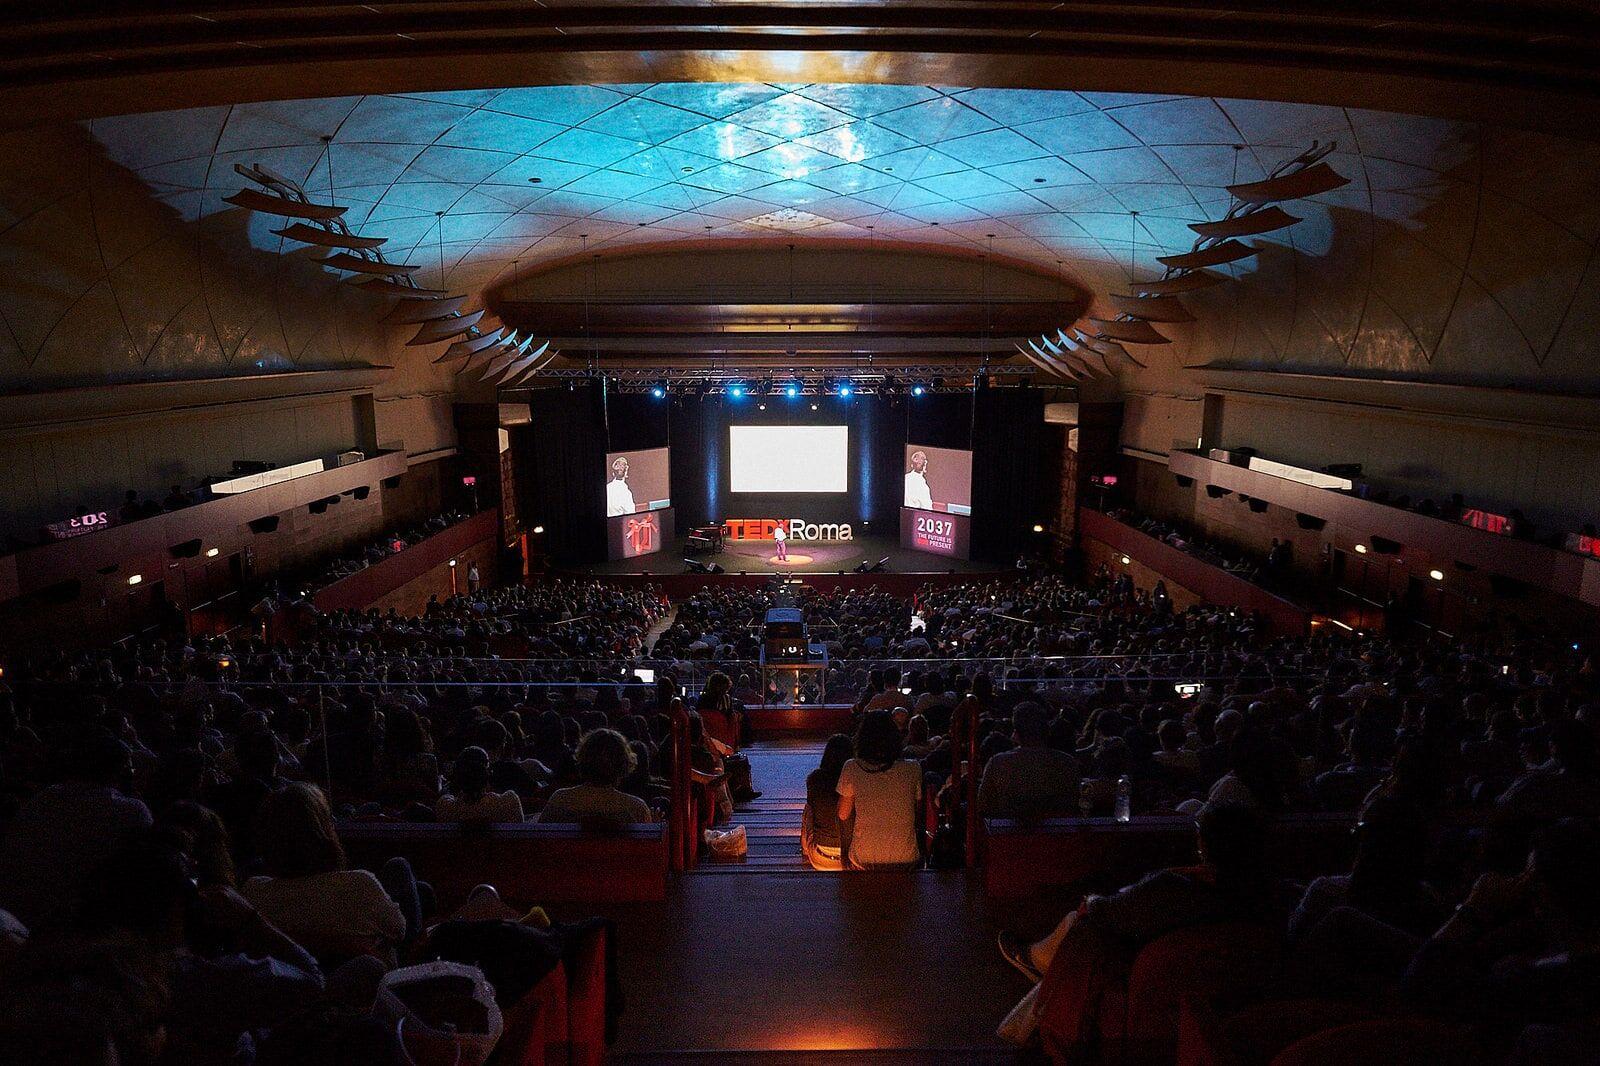 TEDxRoma 2018 Ph Edoardo Iacolucci (Press Bartoli)